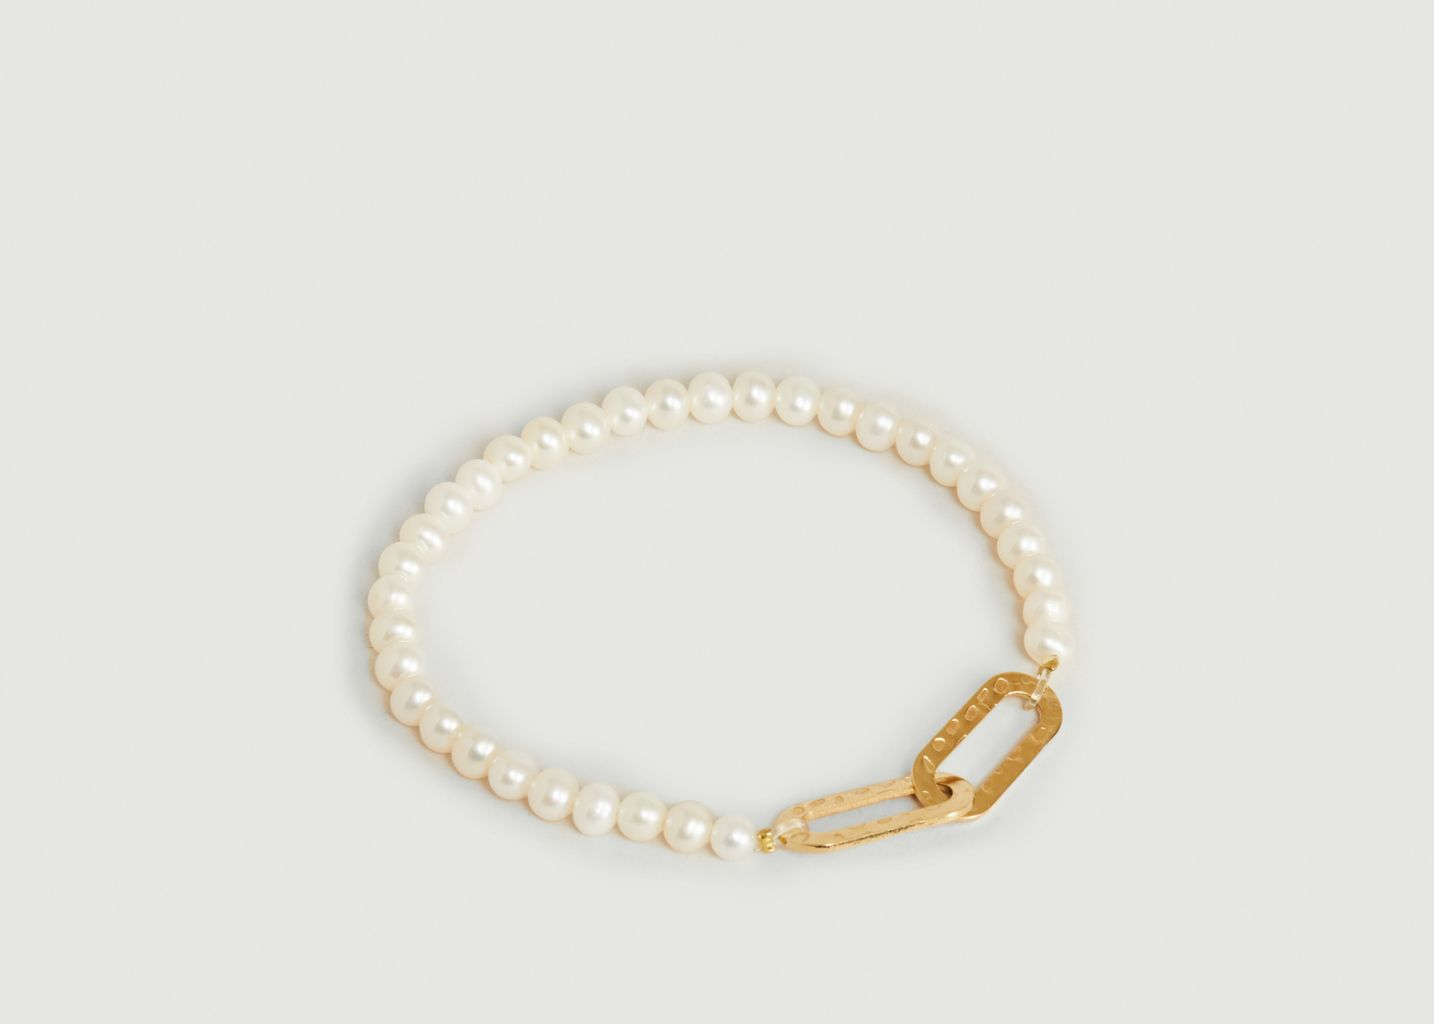 Bracelet Wallis maxi - Medecine Douce